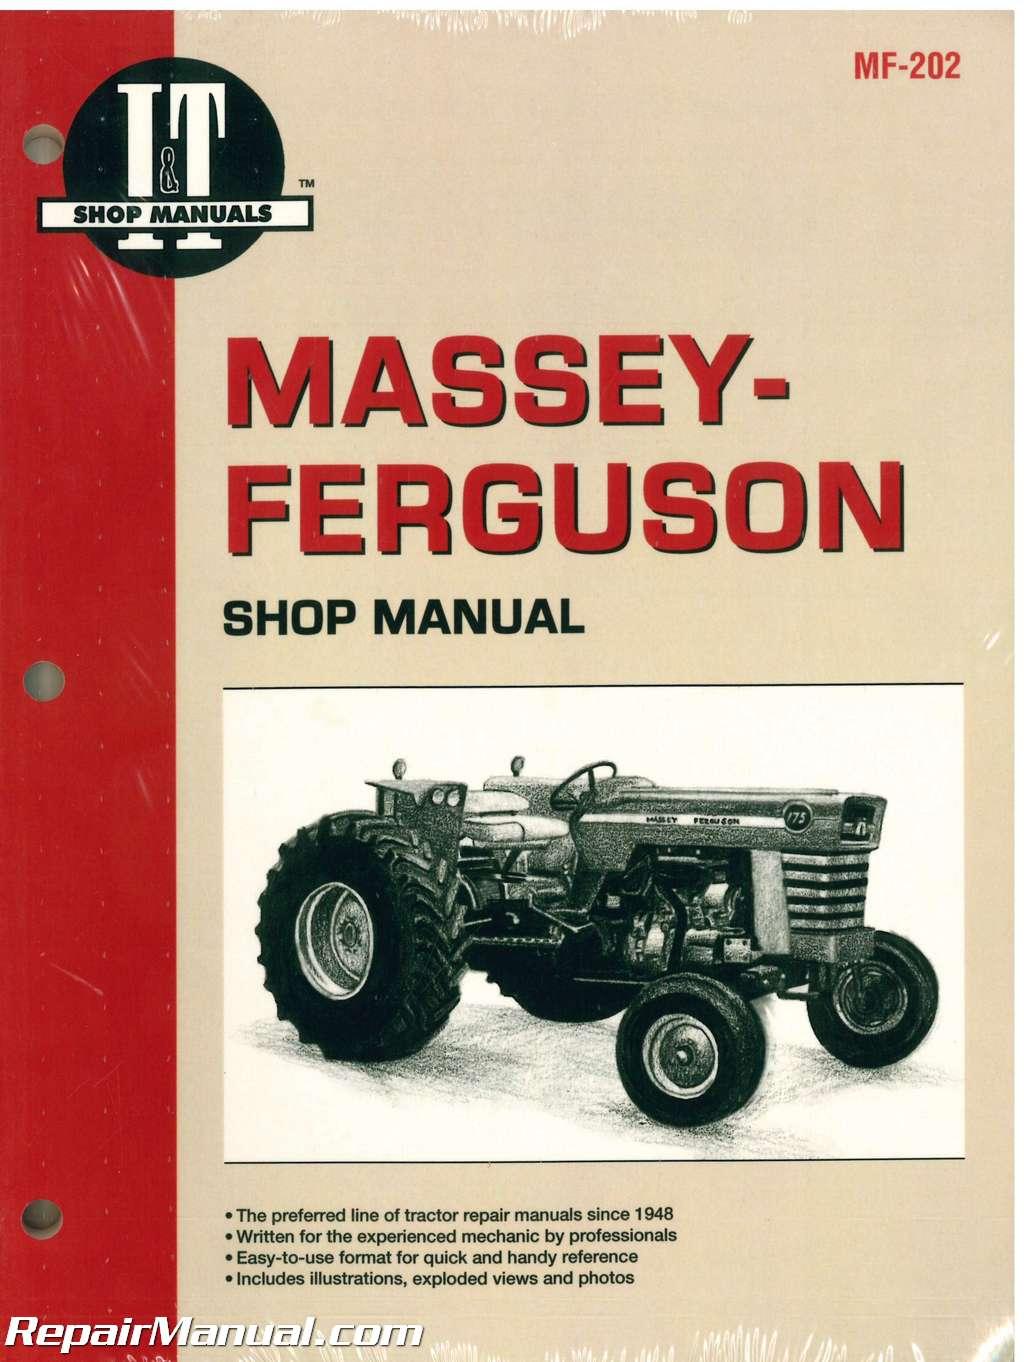 MASSEY-FERGUSON MF175 MF180 MF205 MF210 MF220 MF2675 MF2705 MF2745 MF2775  MF2805 Service Manual